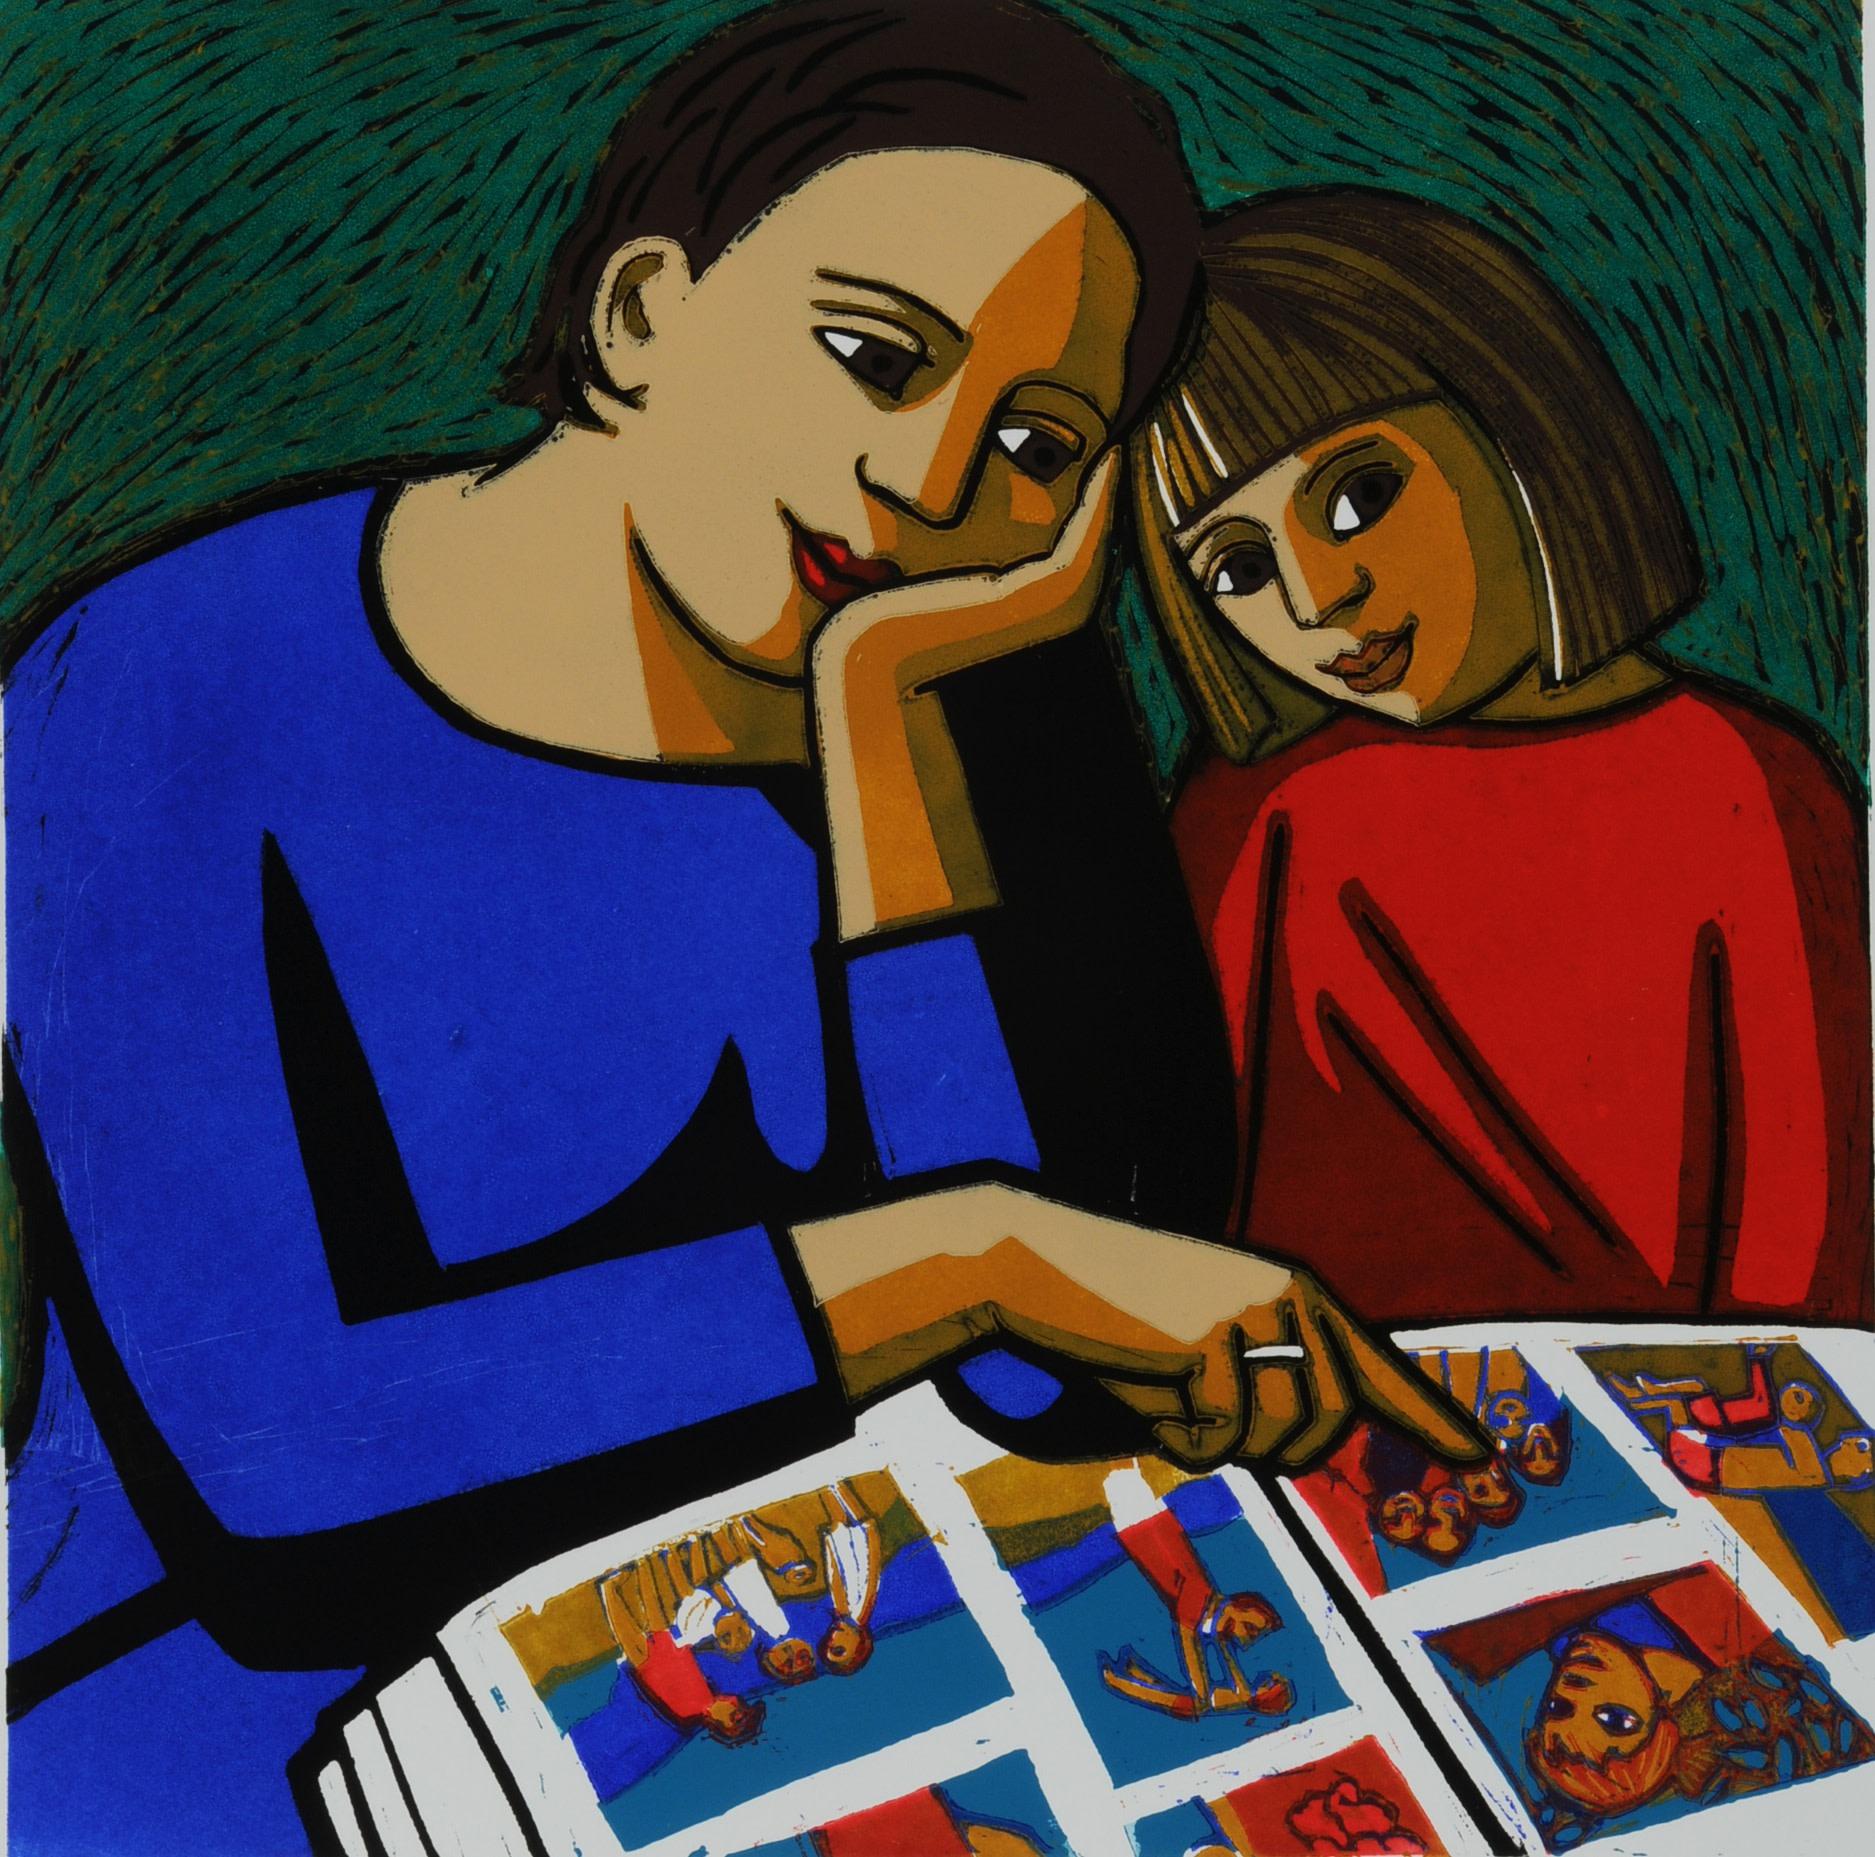 "<span class=""link fancybox-details-link""><a href=""/exhibitions/24/works/artworks_standalone11348/"">View Detail Page</a></span><div class=""artist""><span class=""artist""><strong>Anita Klein PPRE Hon RWS</strong></span></div><div class=""title""><em>The Photo Album</em></div><div class=""medium"">linocut</div><div class=""dimensions"">65 x 63 cm framed size<br>45 x 45 cm image size</div><div class=""edition_details"">edition of 50</div>"